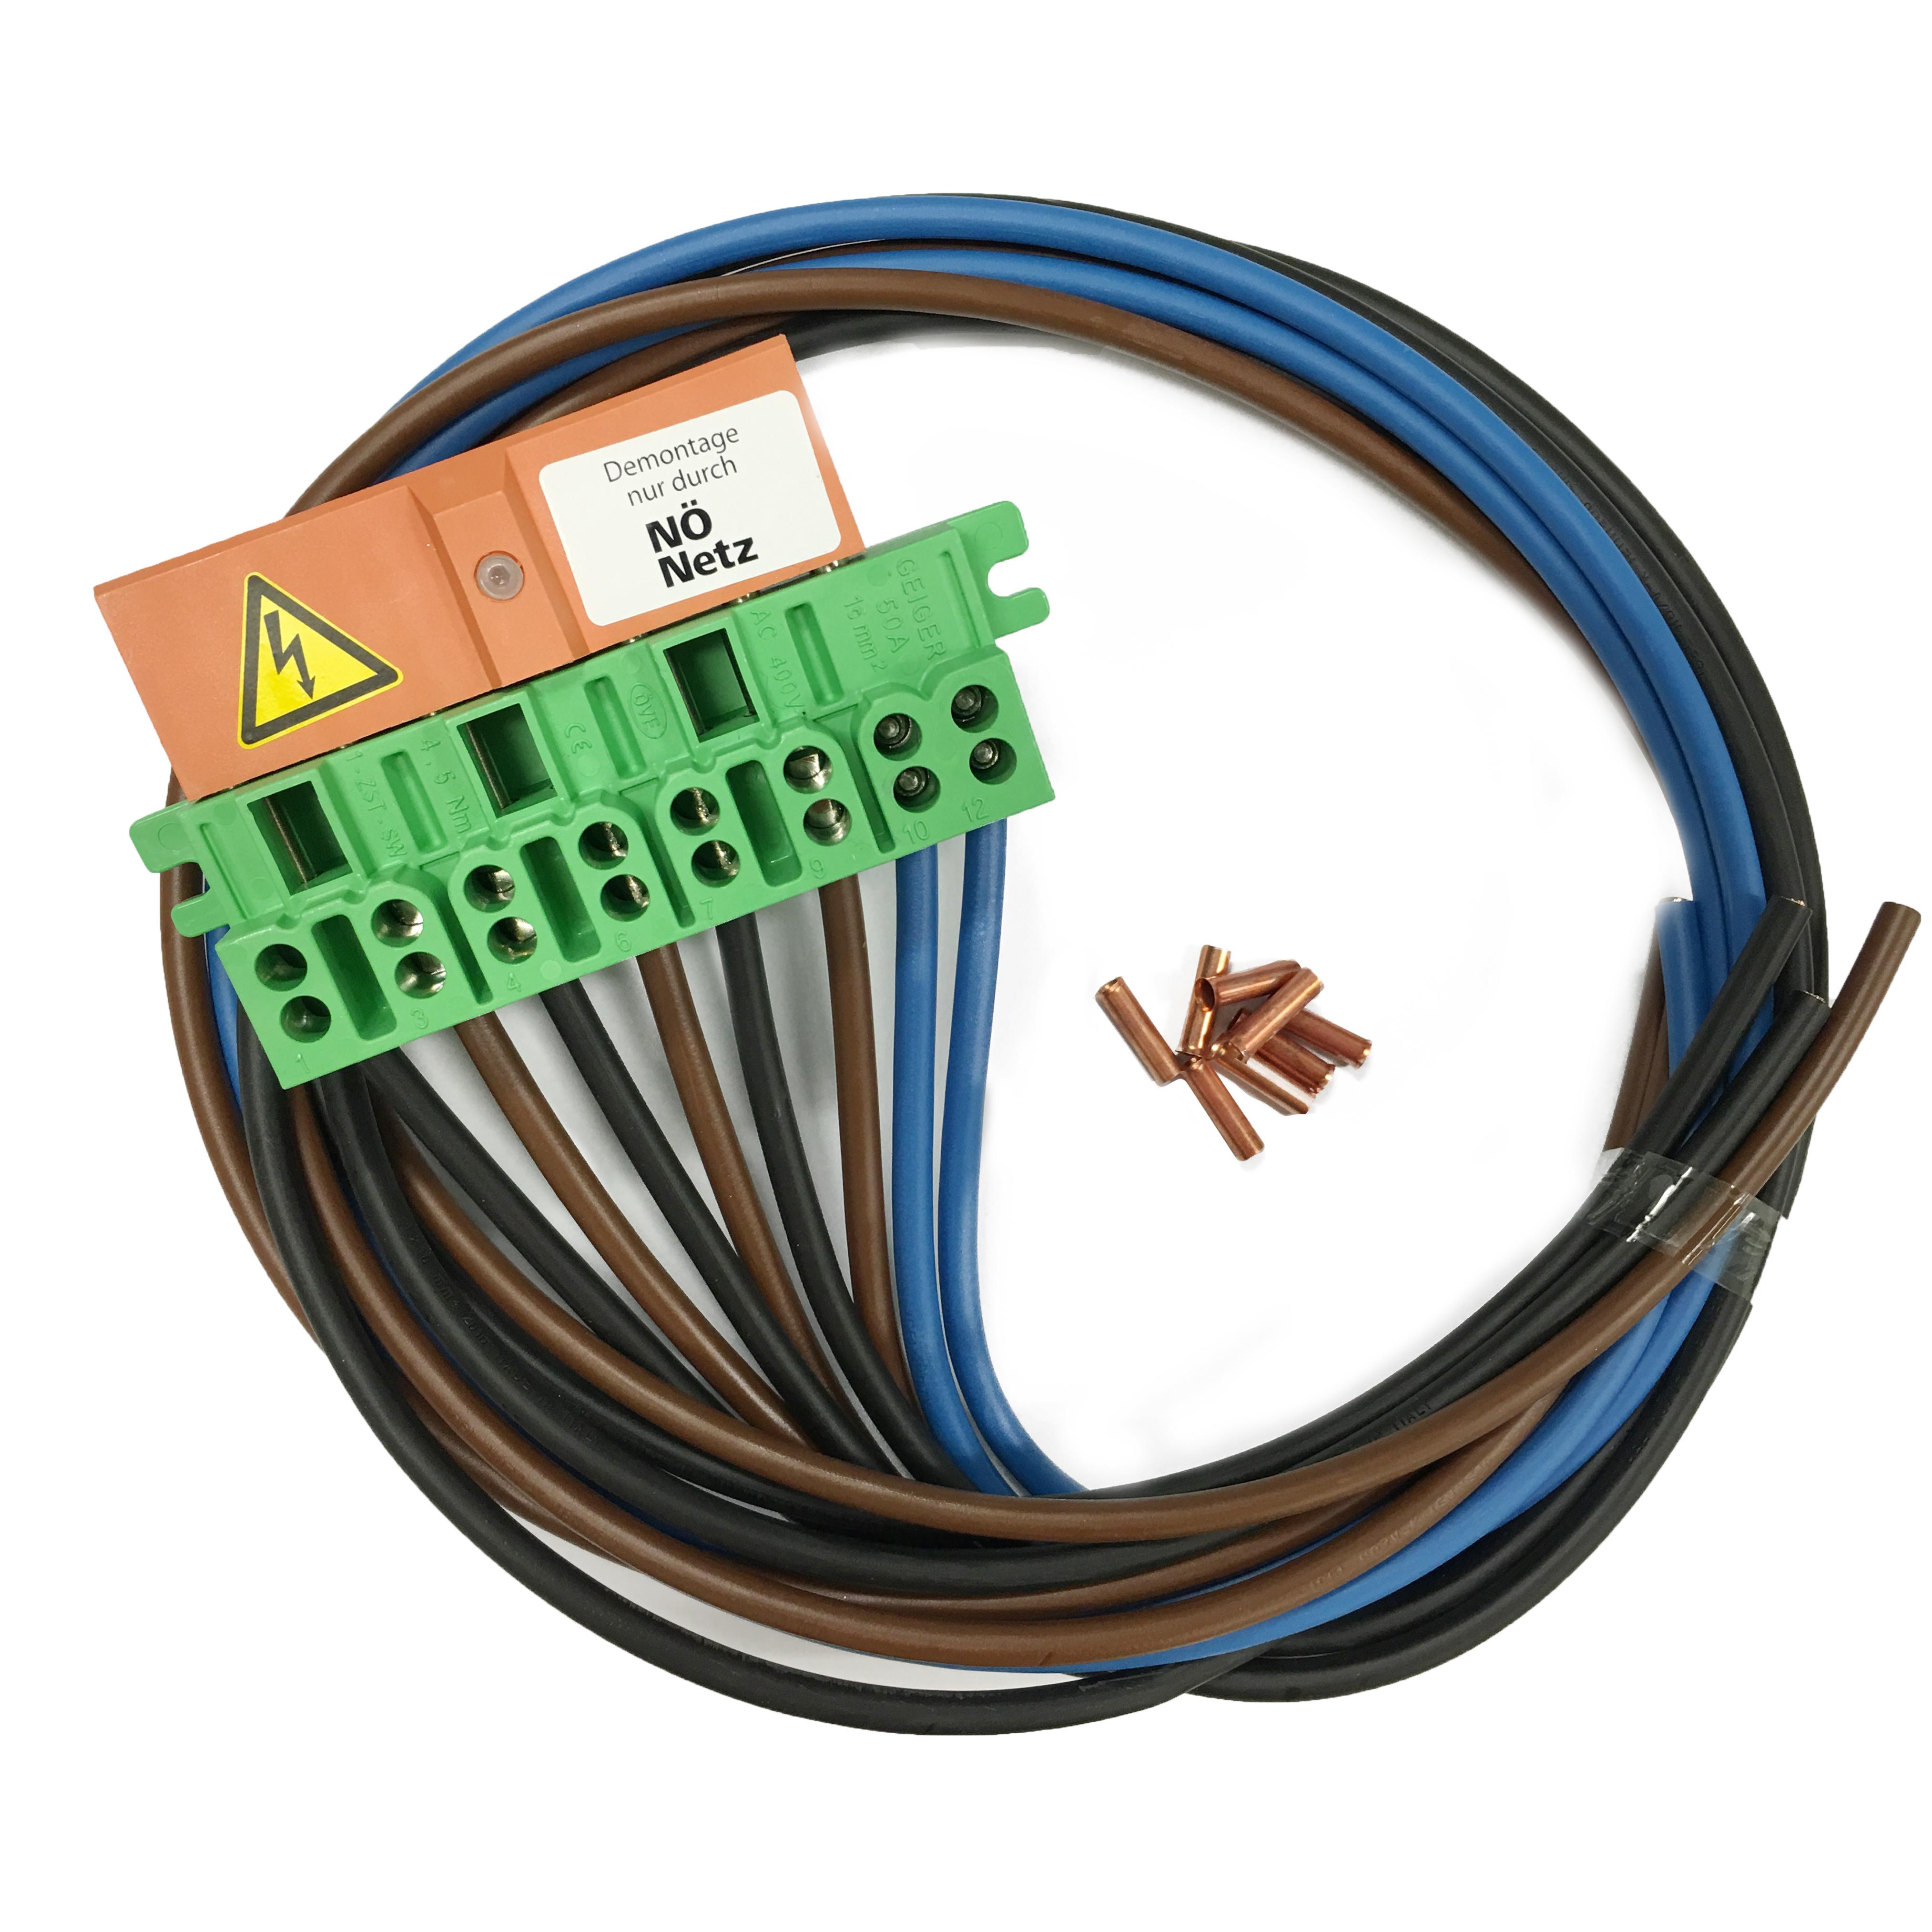 1 Stk 4-polige Zähleranschlussklemme 50A + 2,0m Kabel EVN grün IL900167--